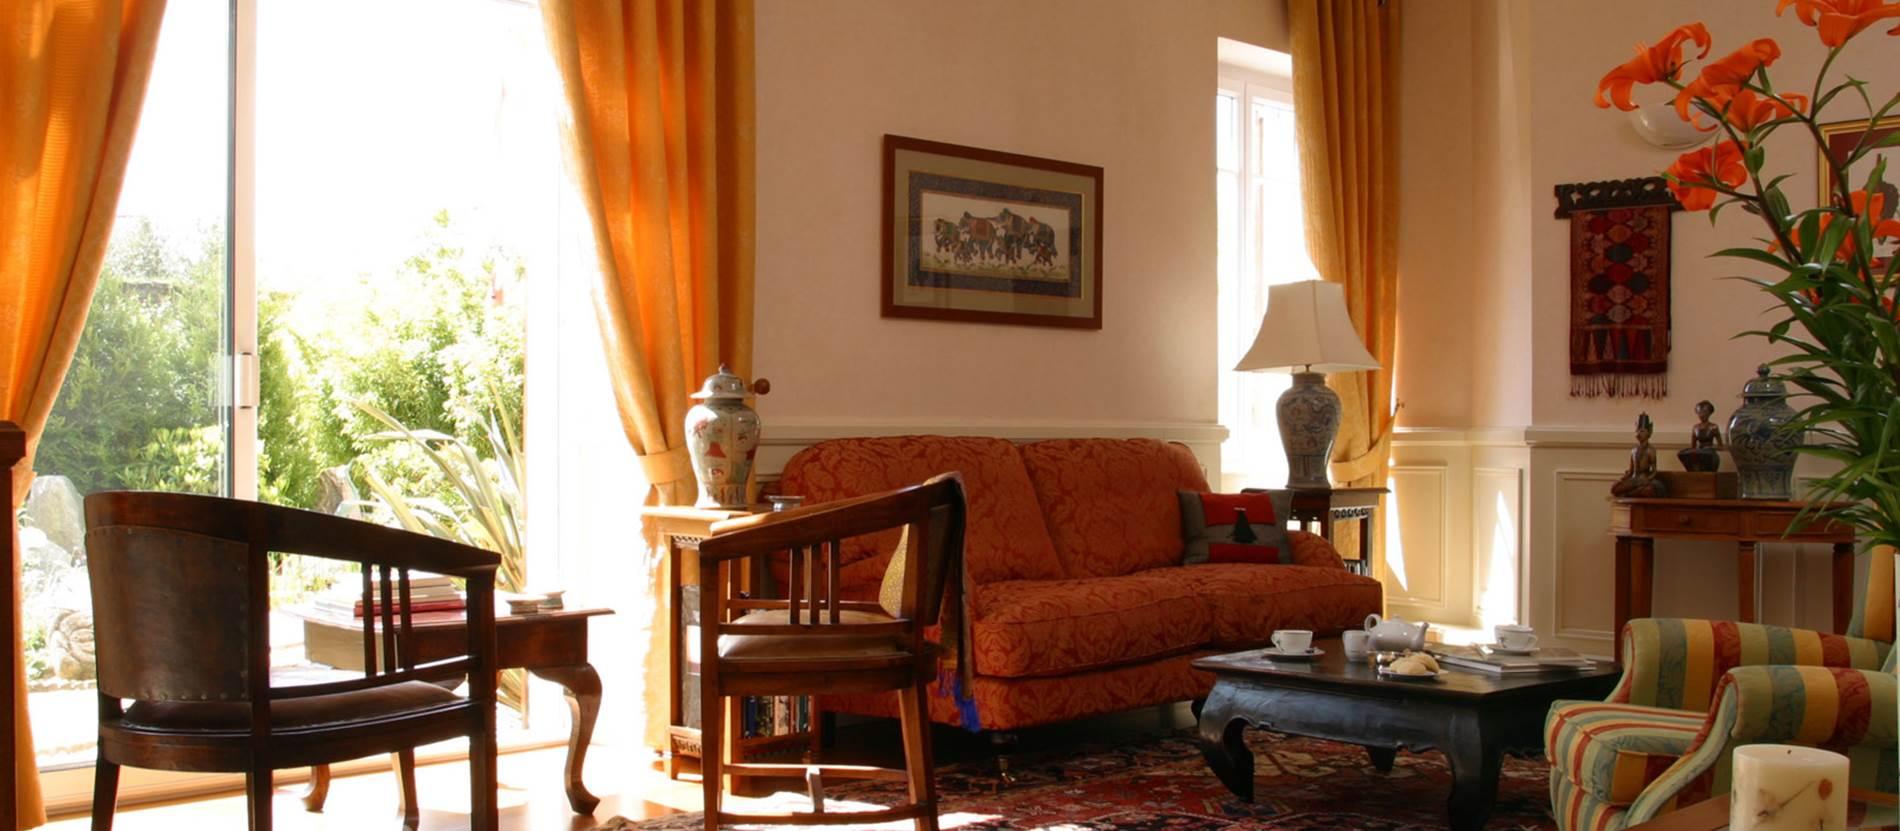 Hotel Villa Kerasy Hotel Spa -Vannes - Morbihan Bretagne Sud © Hotel Villa Kerasy Hotel Spa -Vannes